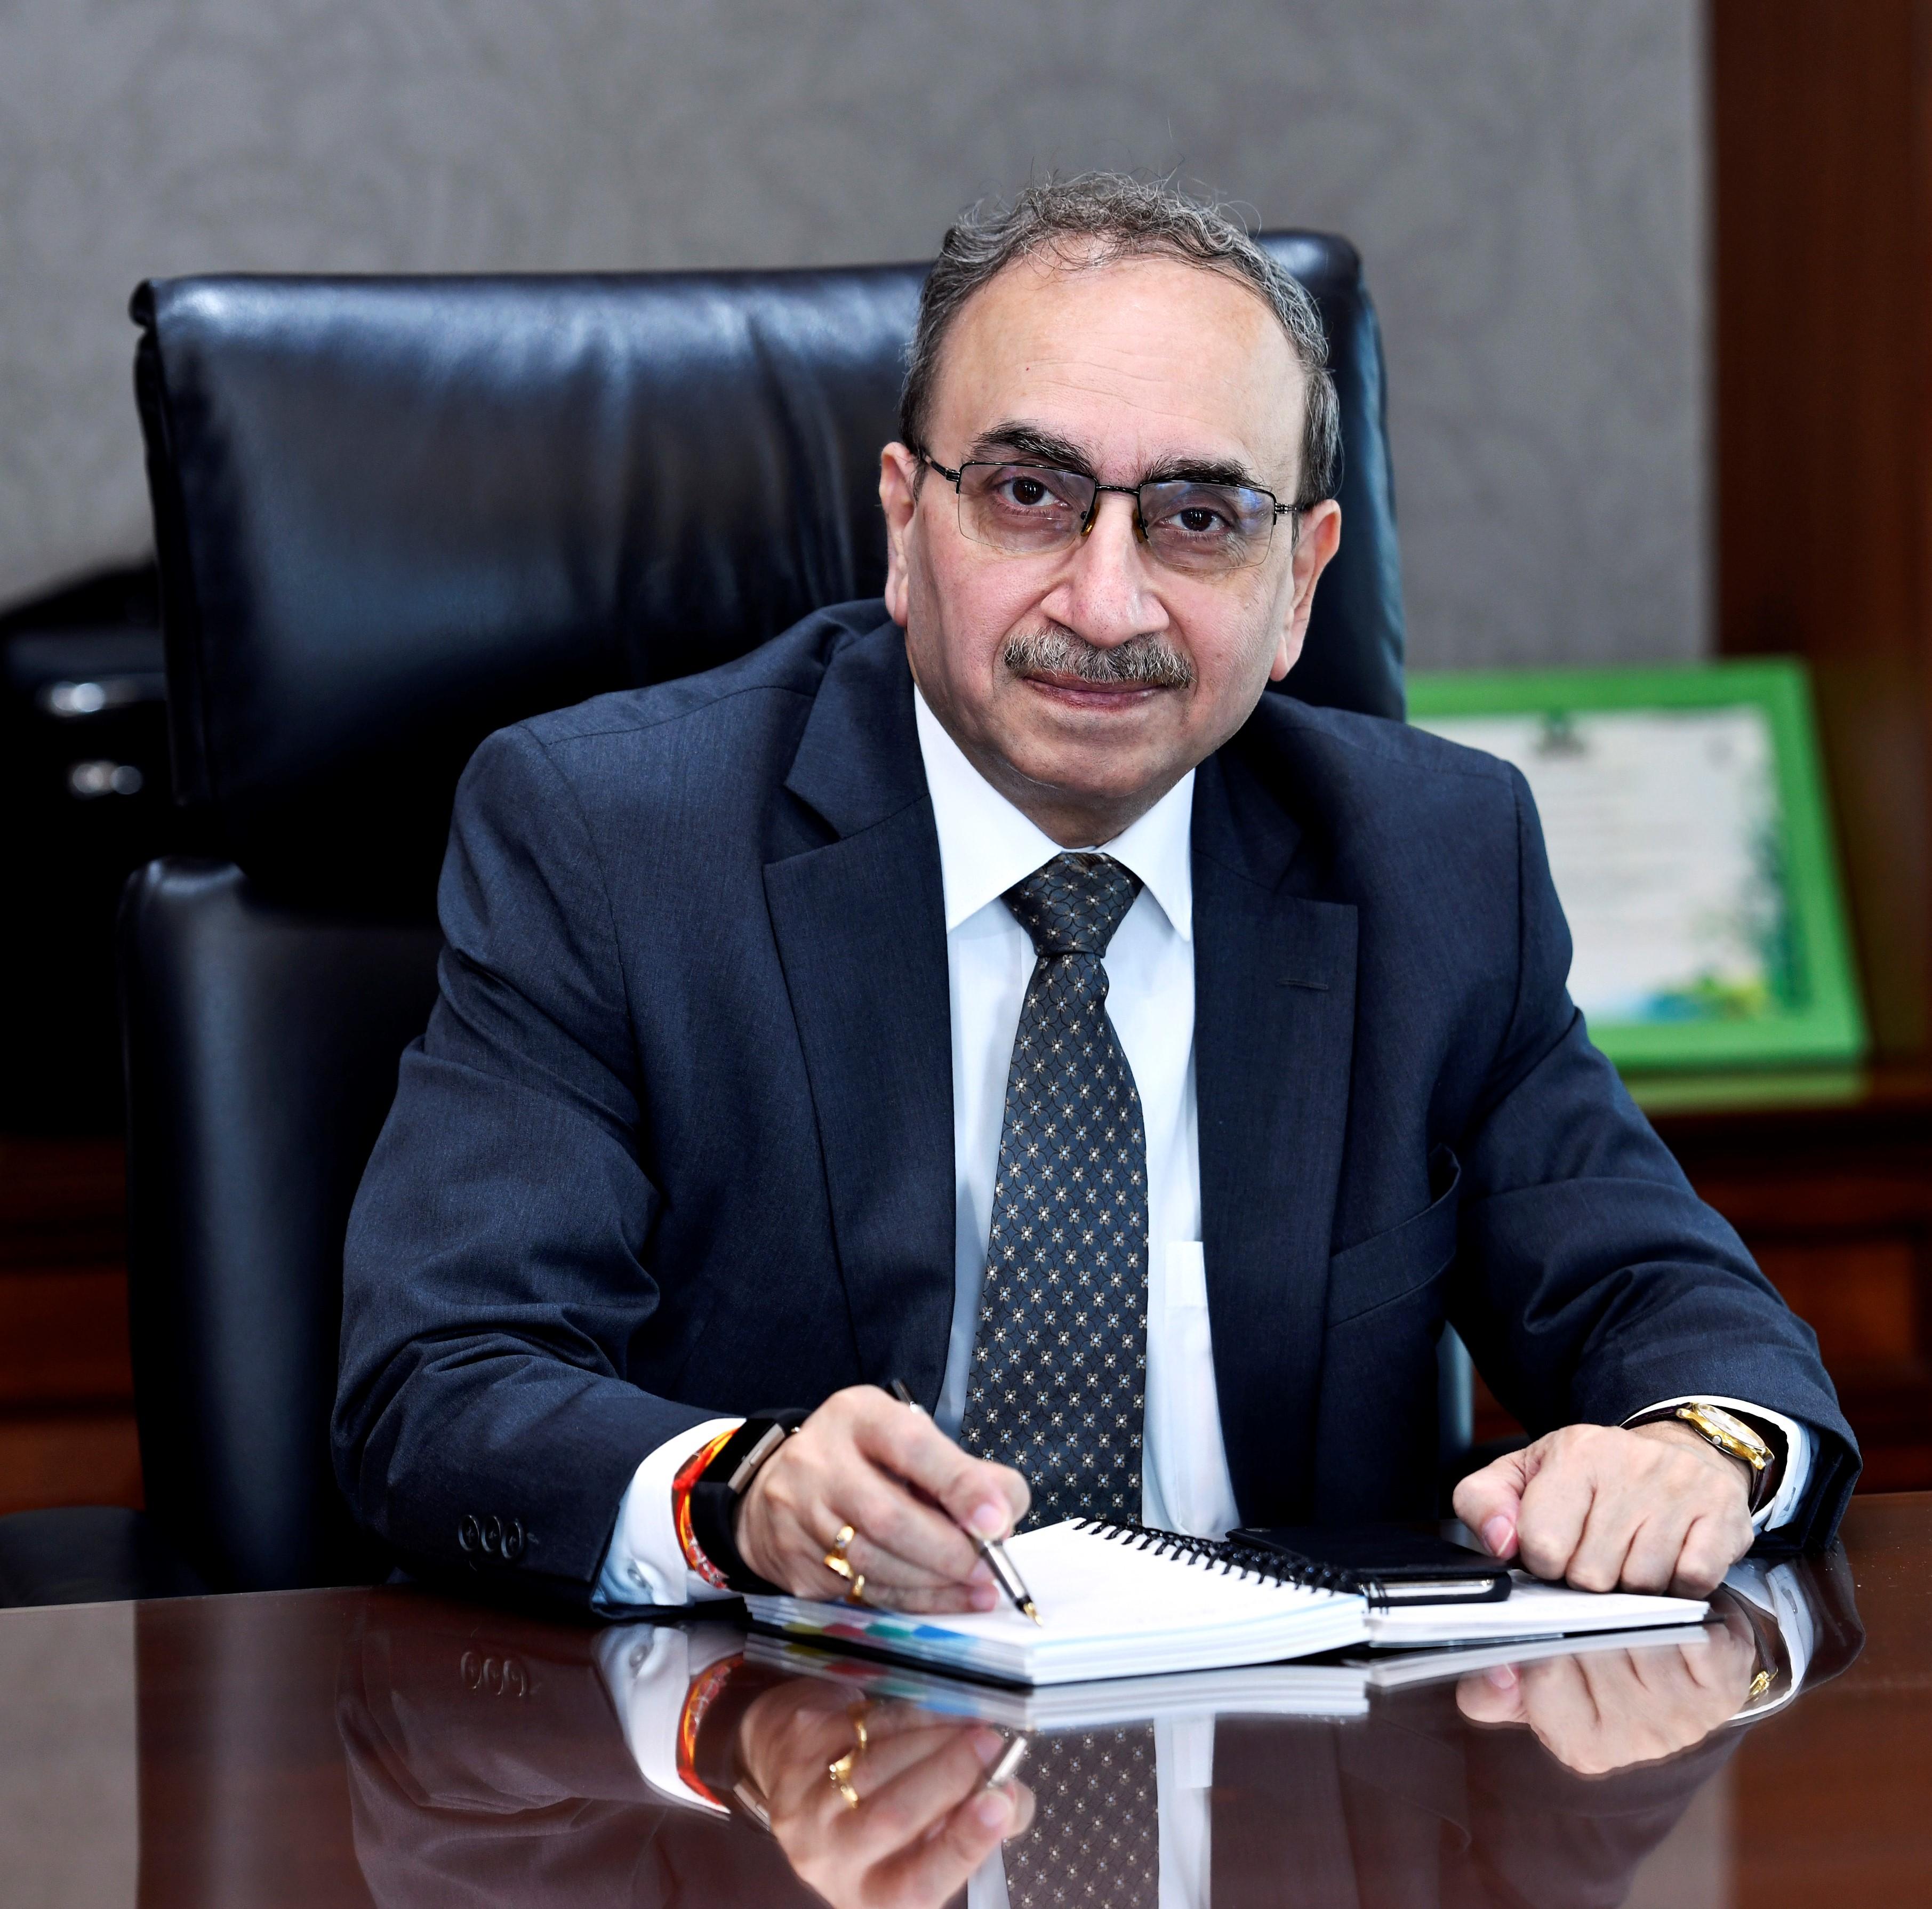 CEO of SBI is Dinesh Kumar Khara